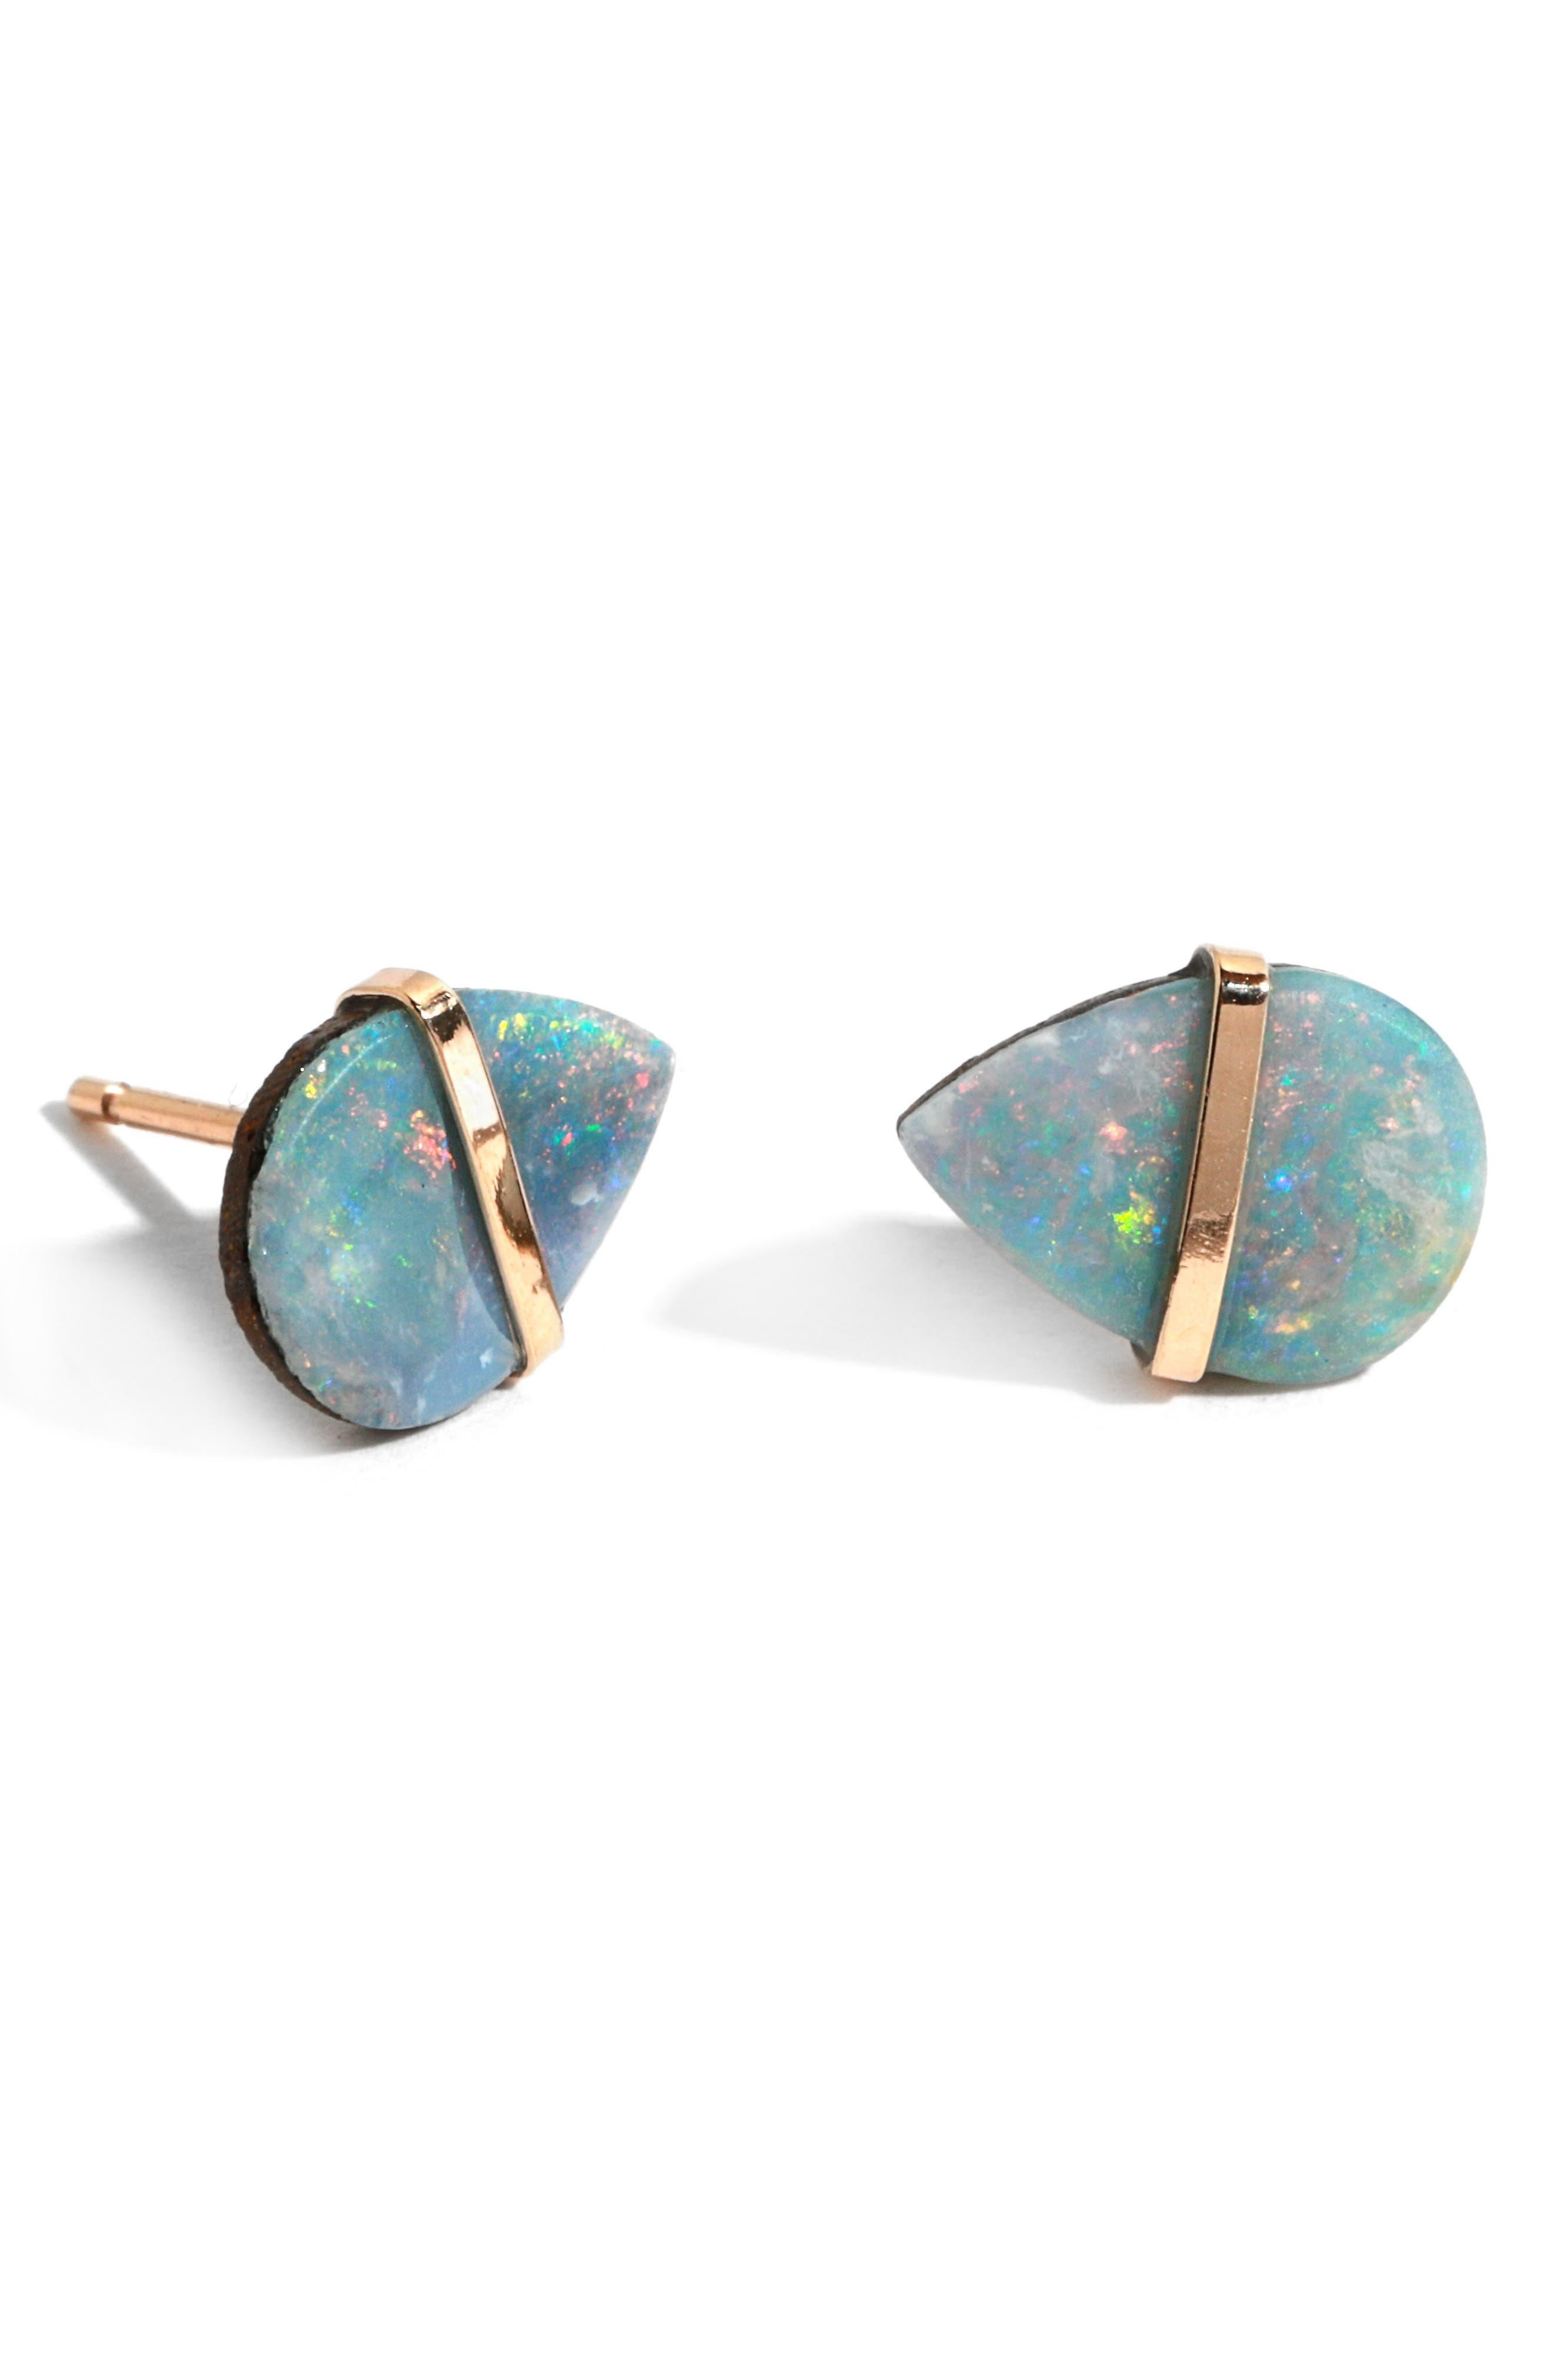 Melissa Joy Manning Semiprecious Stone Stud Earrings